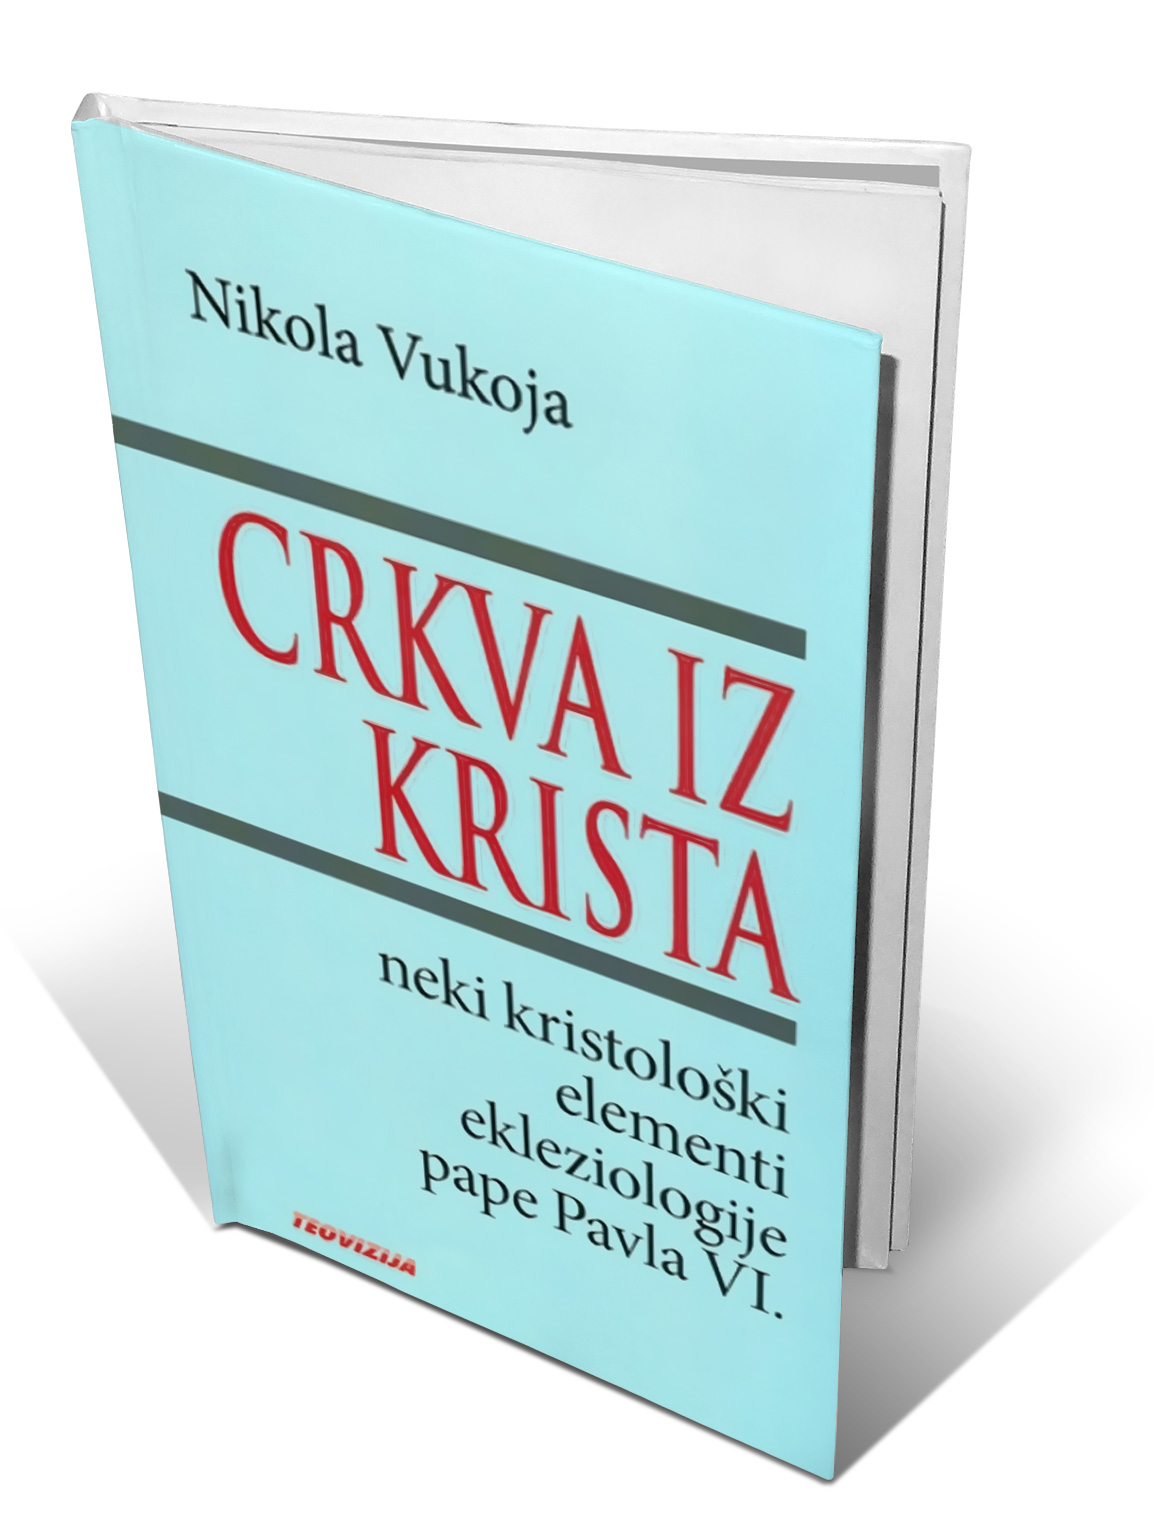 CRKVA IZ KRISTA - Nikola Vukoja